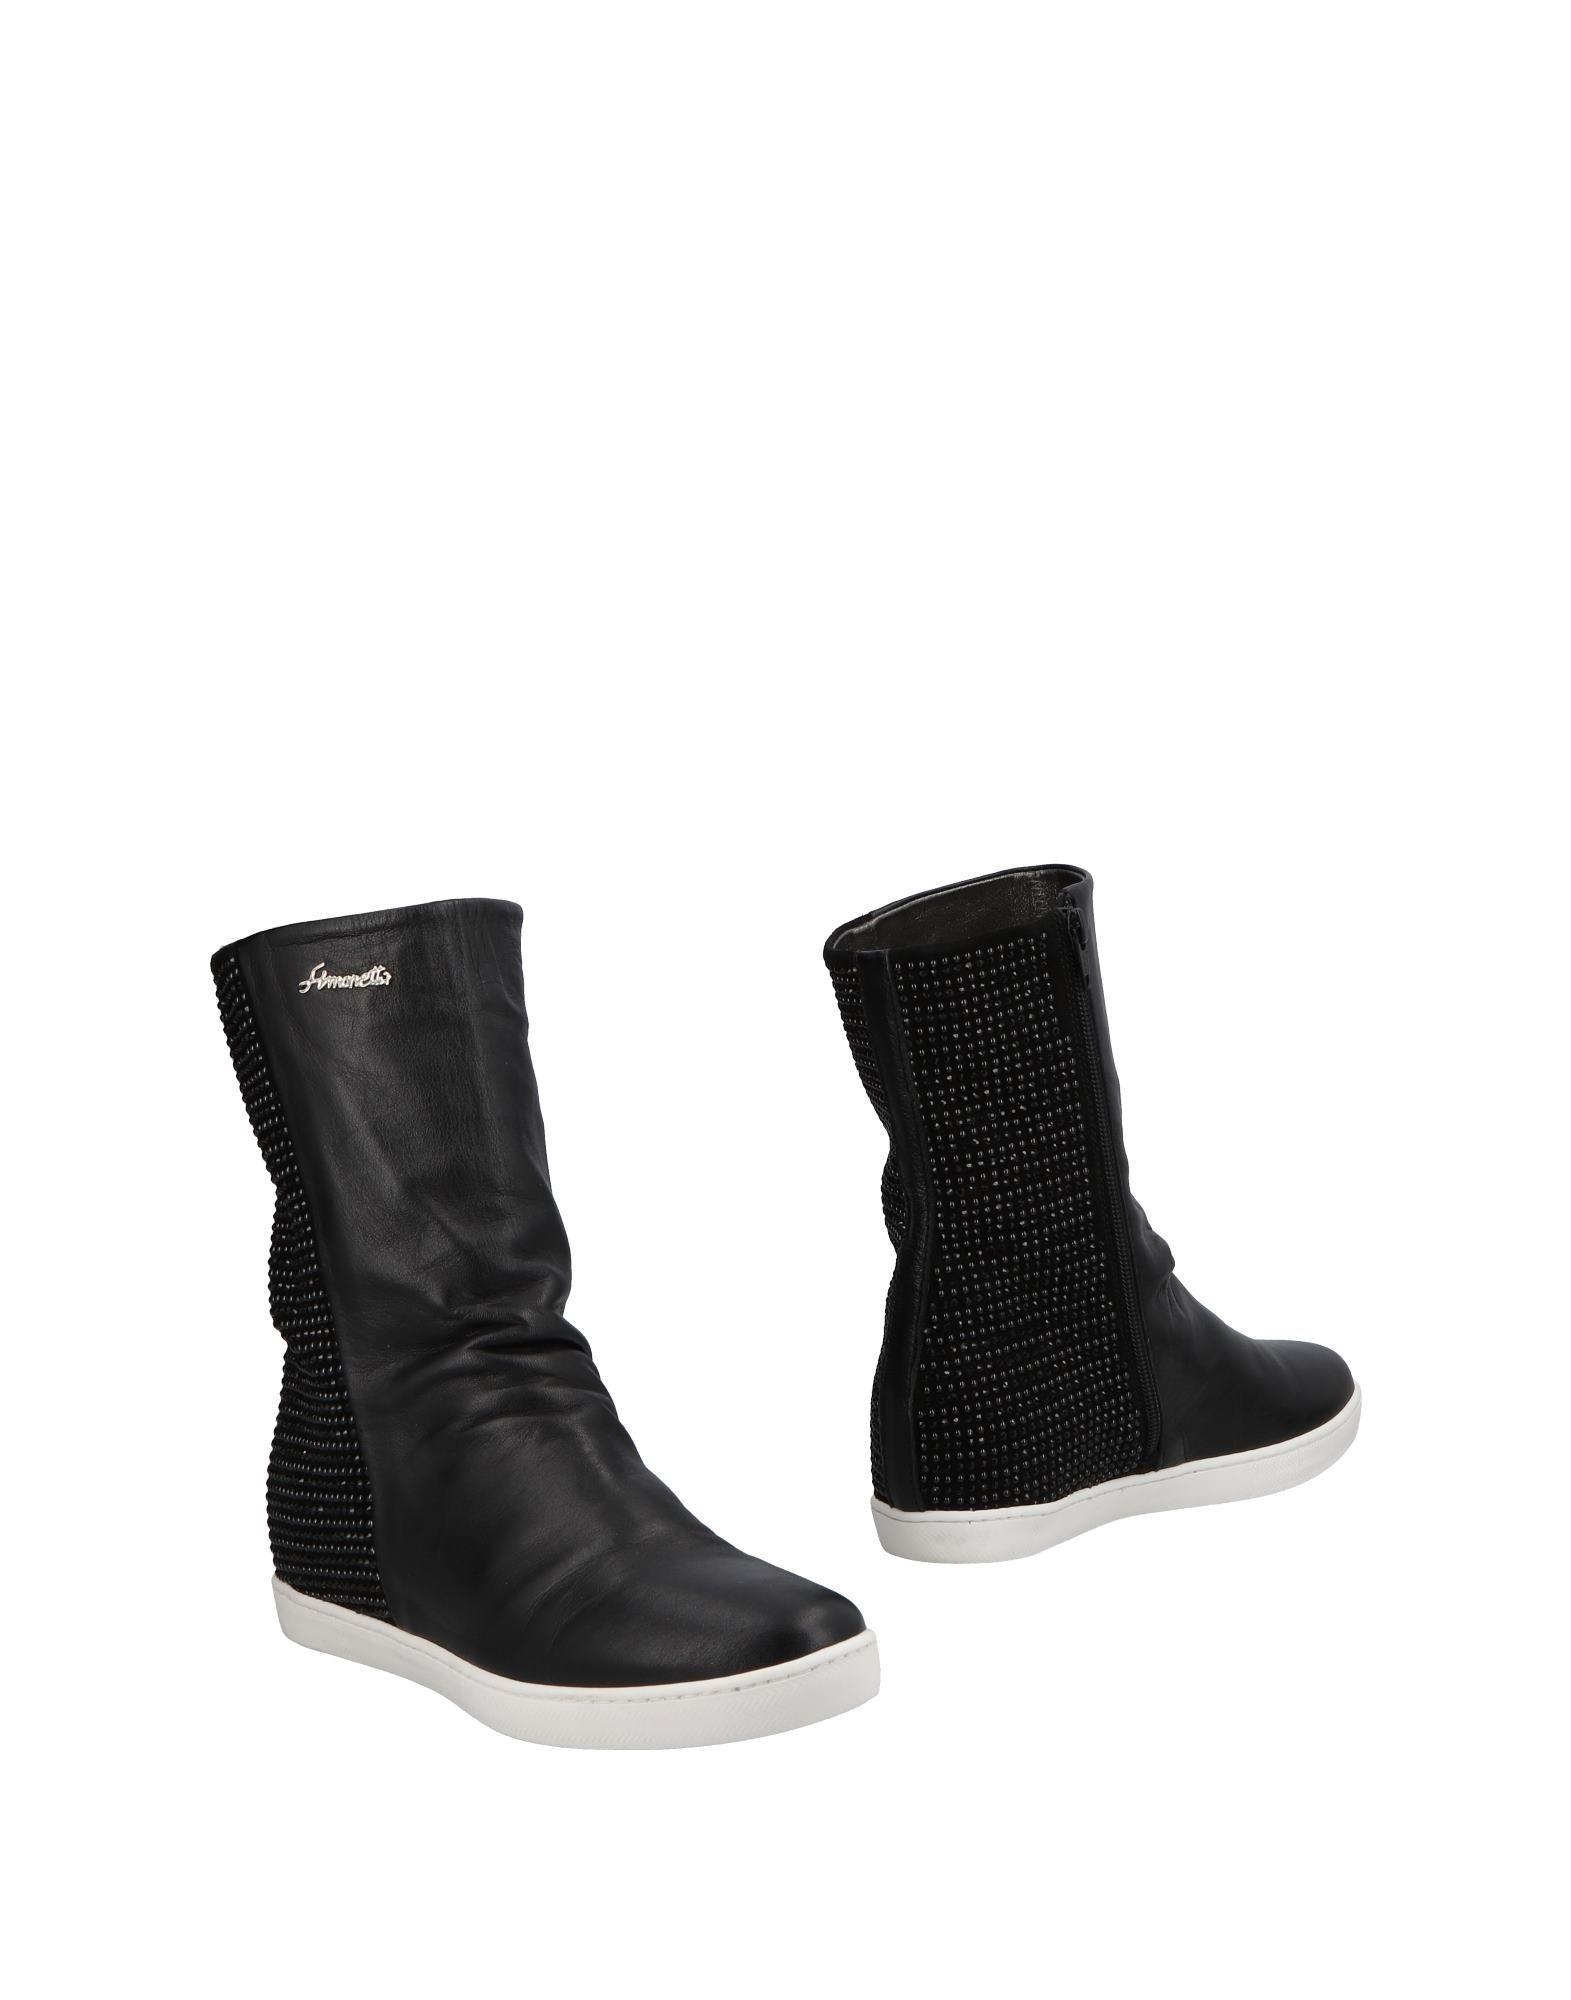 Simonetta Ankle Boot - Women on Simonetta Ankle Boots online on Women  Australia - 11480562WD 6f6c49